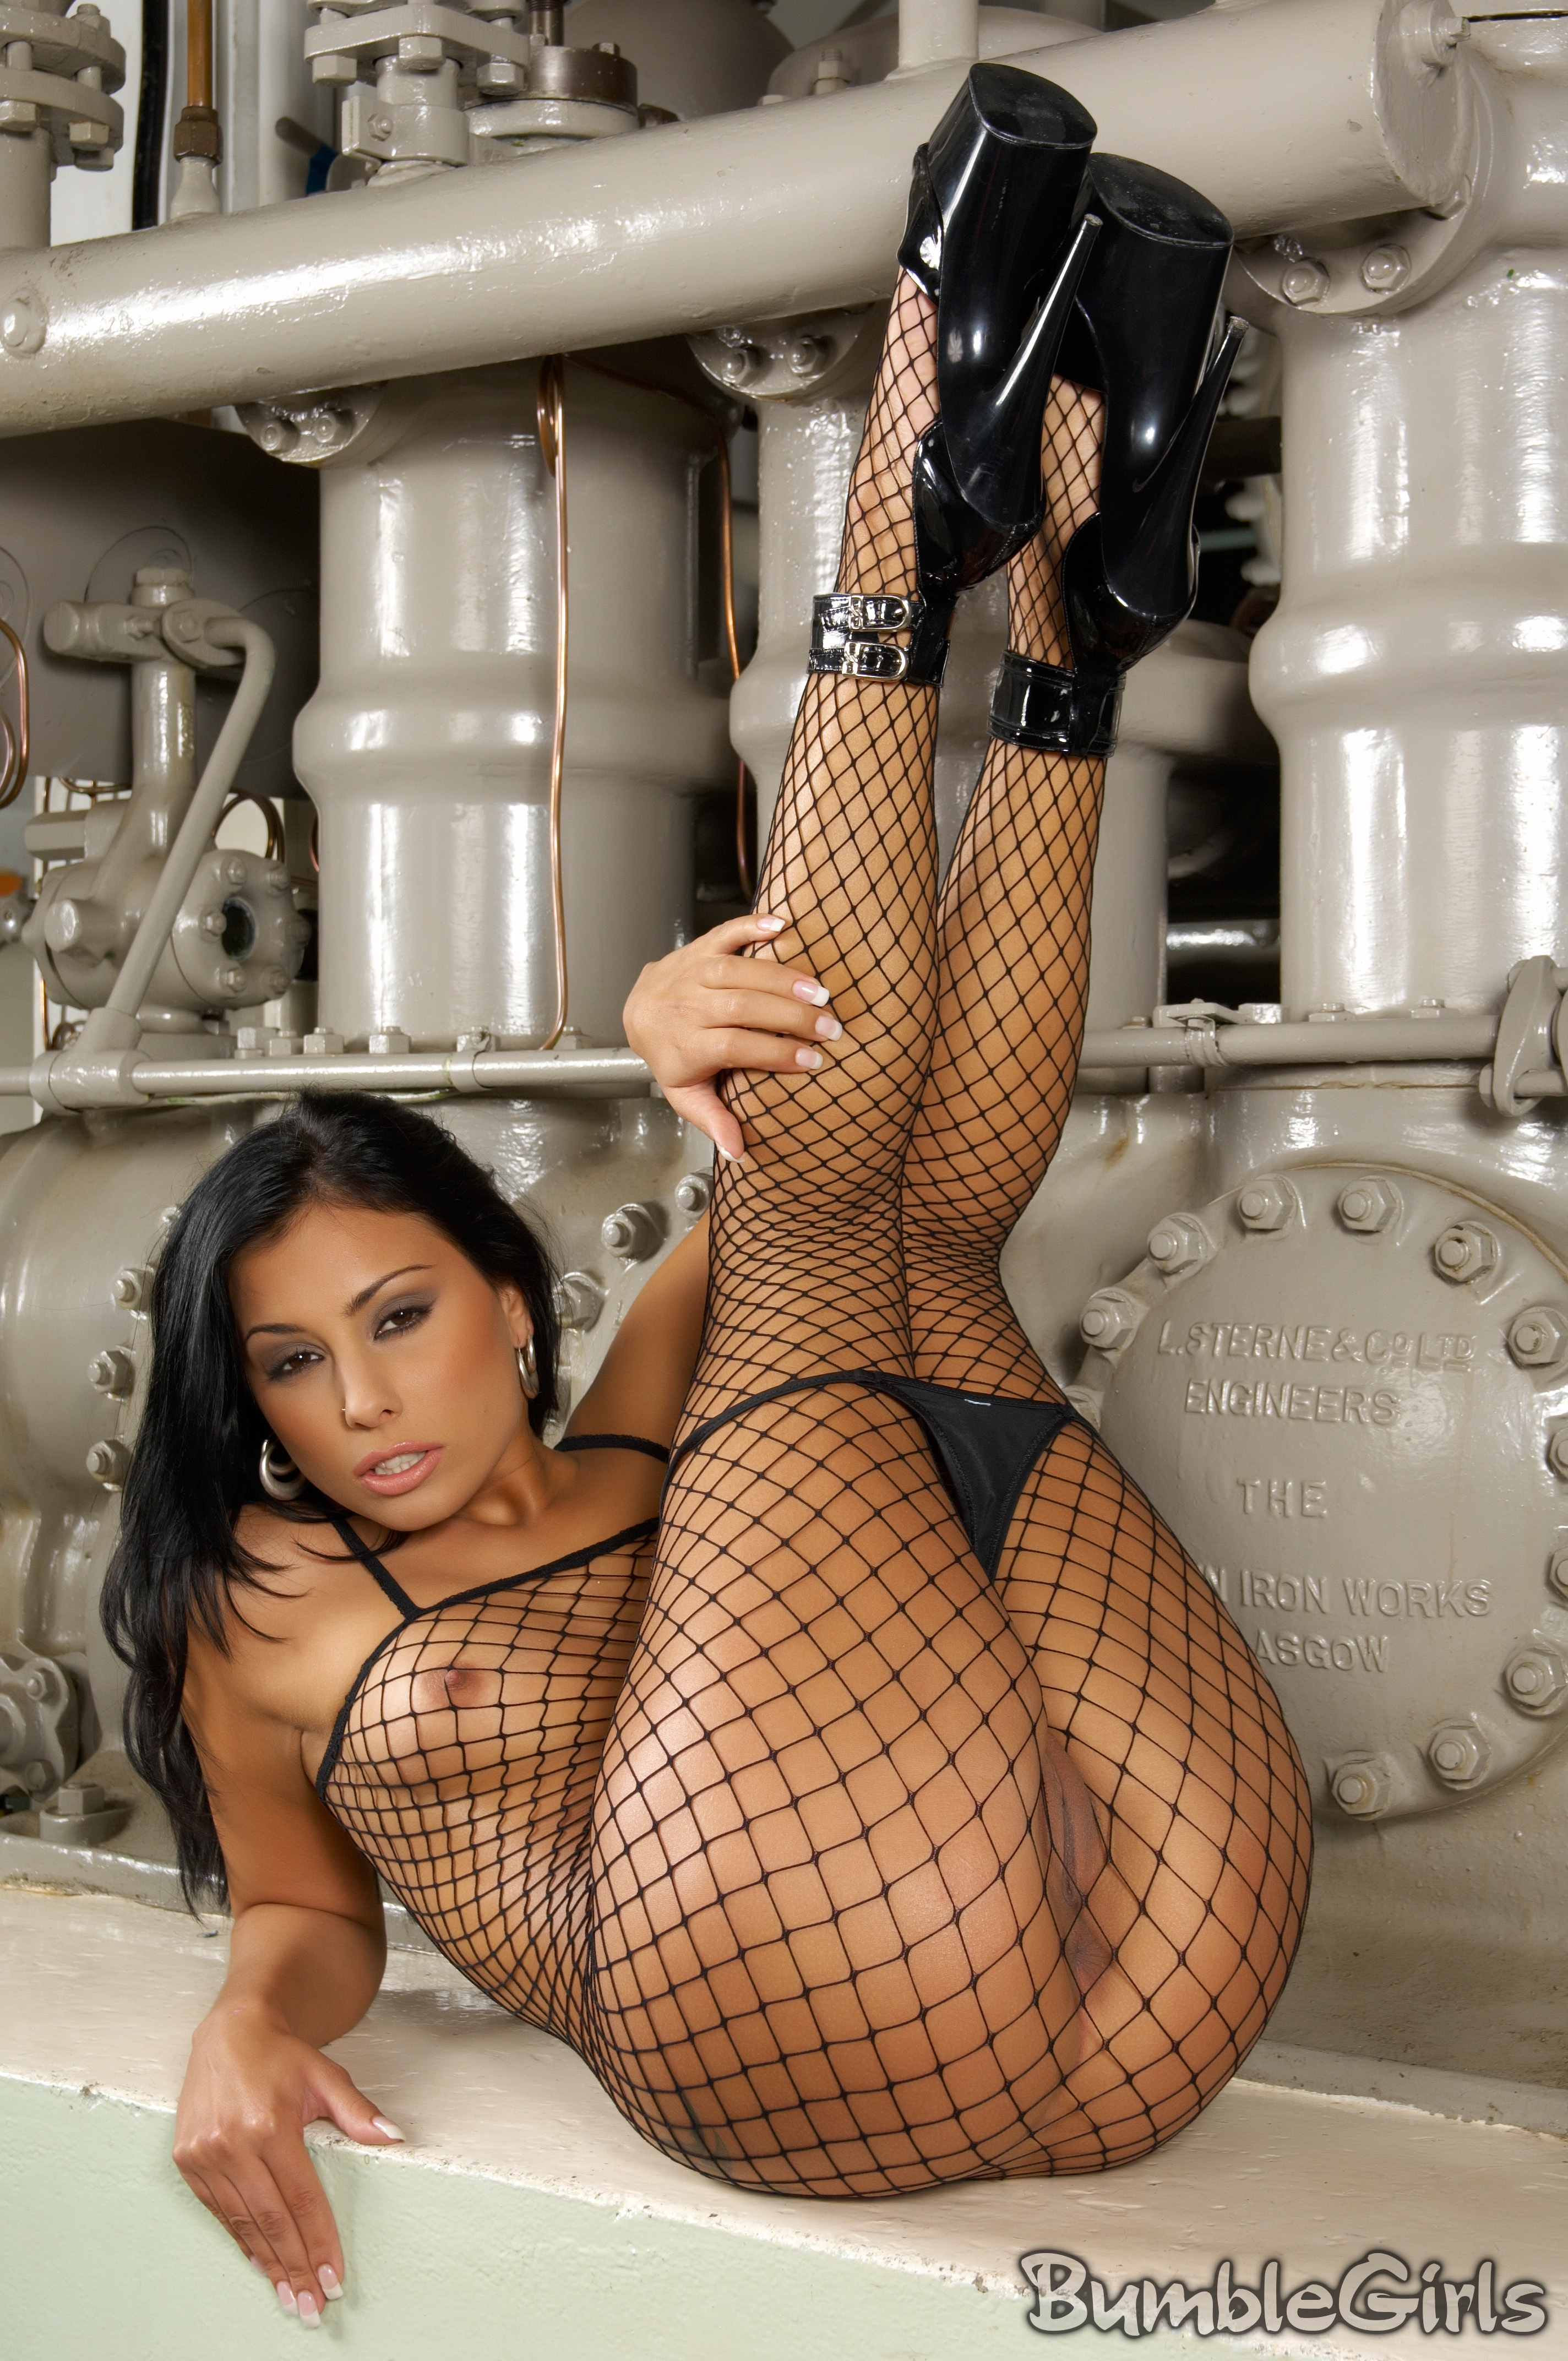 Anetta Keys Porn Sex bumble girls anetta keys 262099 - good sex porn